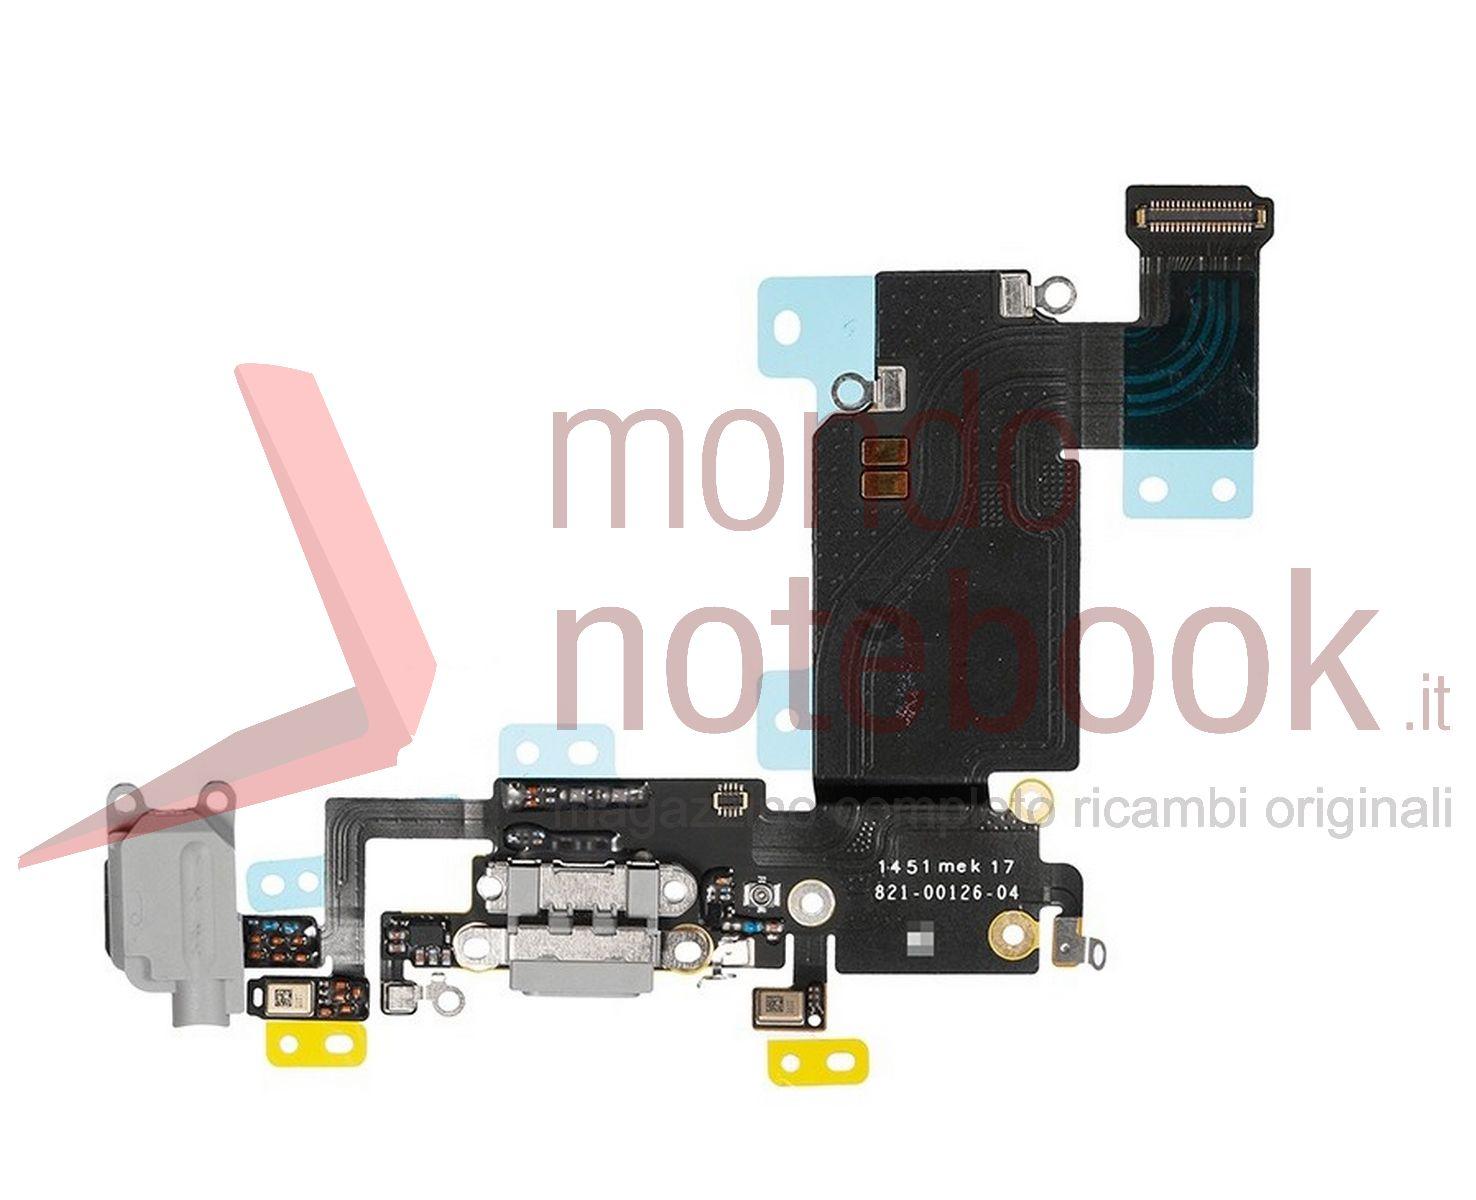 https://www.mondonotebook.it/3887/apple-iphone-6s-plus-charging-port-flex-cable-ribbon-replacement-dark-gray-grade-s-.jpg